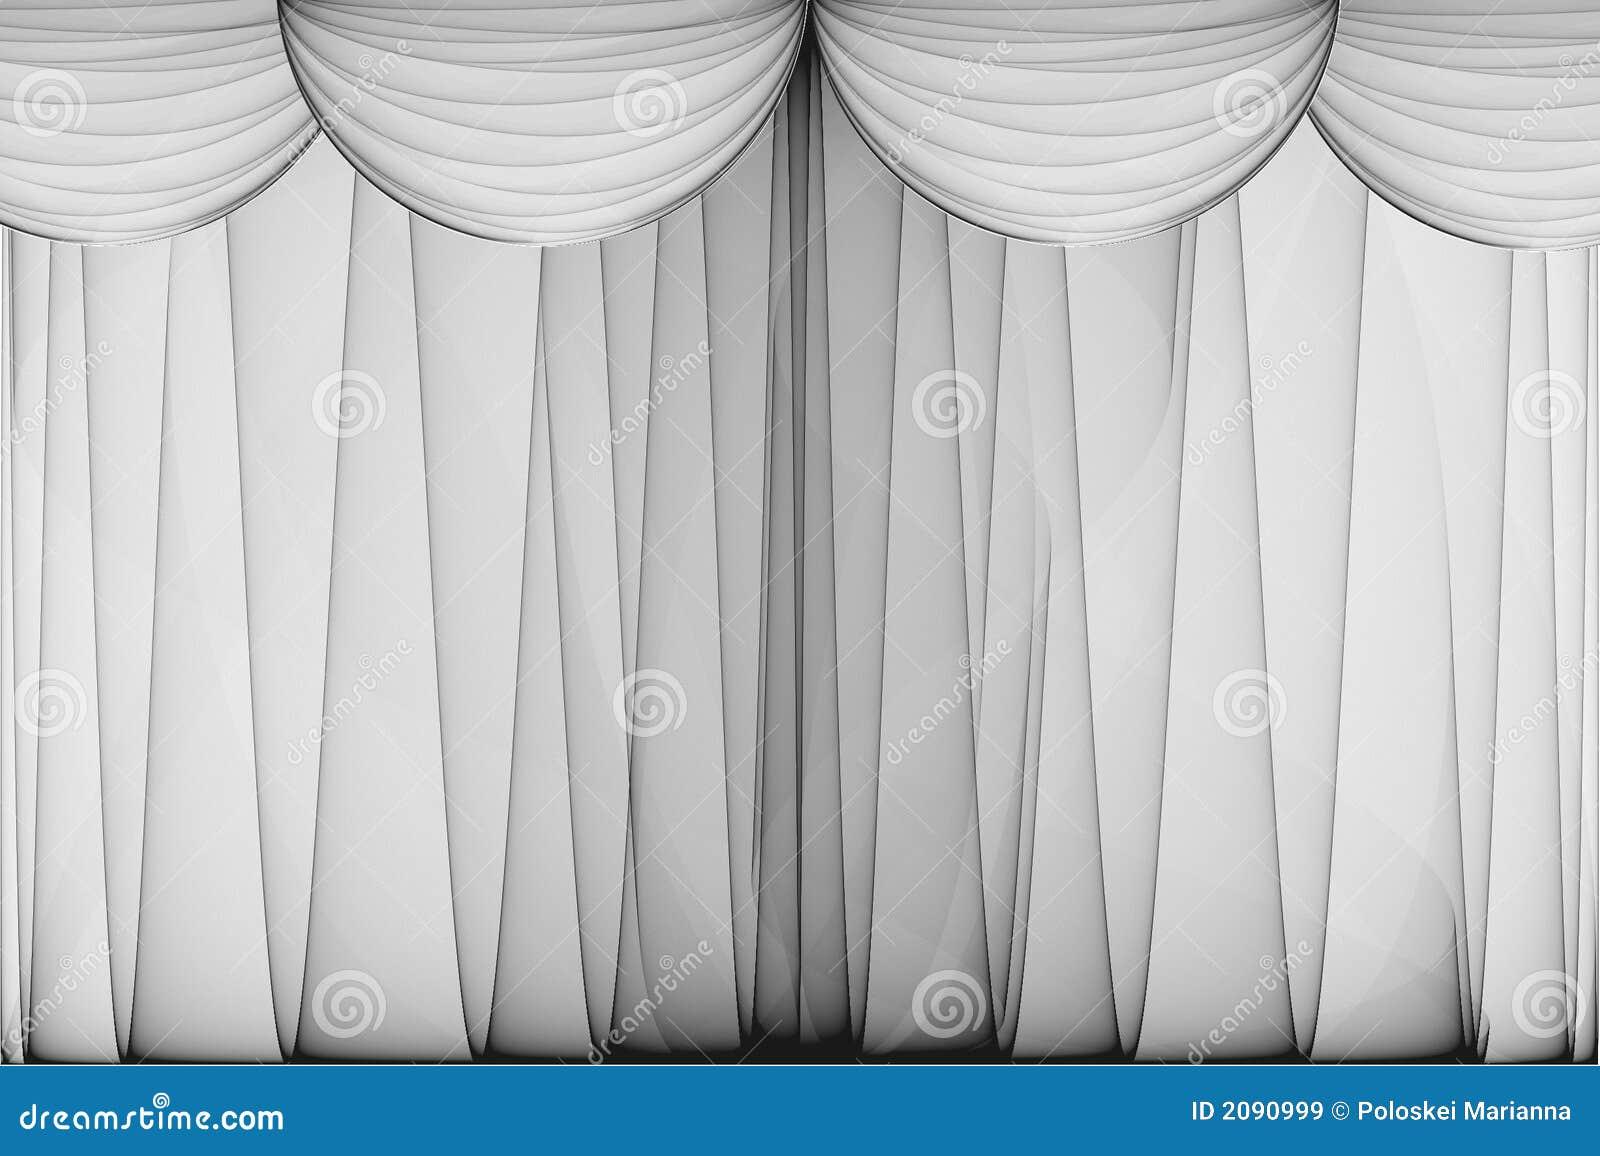 Theater Curtain Stock Image. Image Of Movie, Elegant